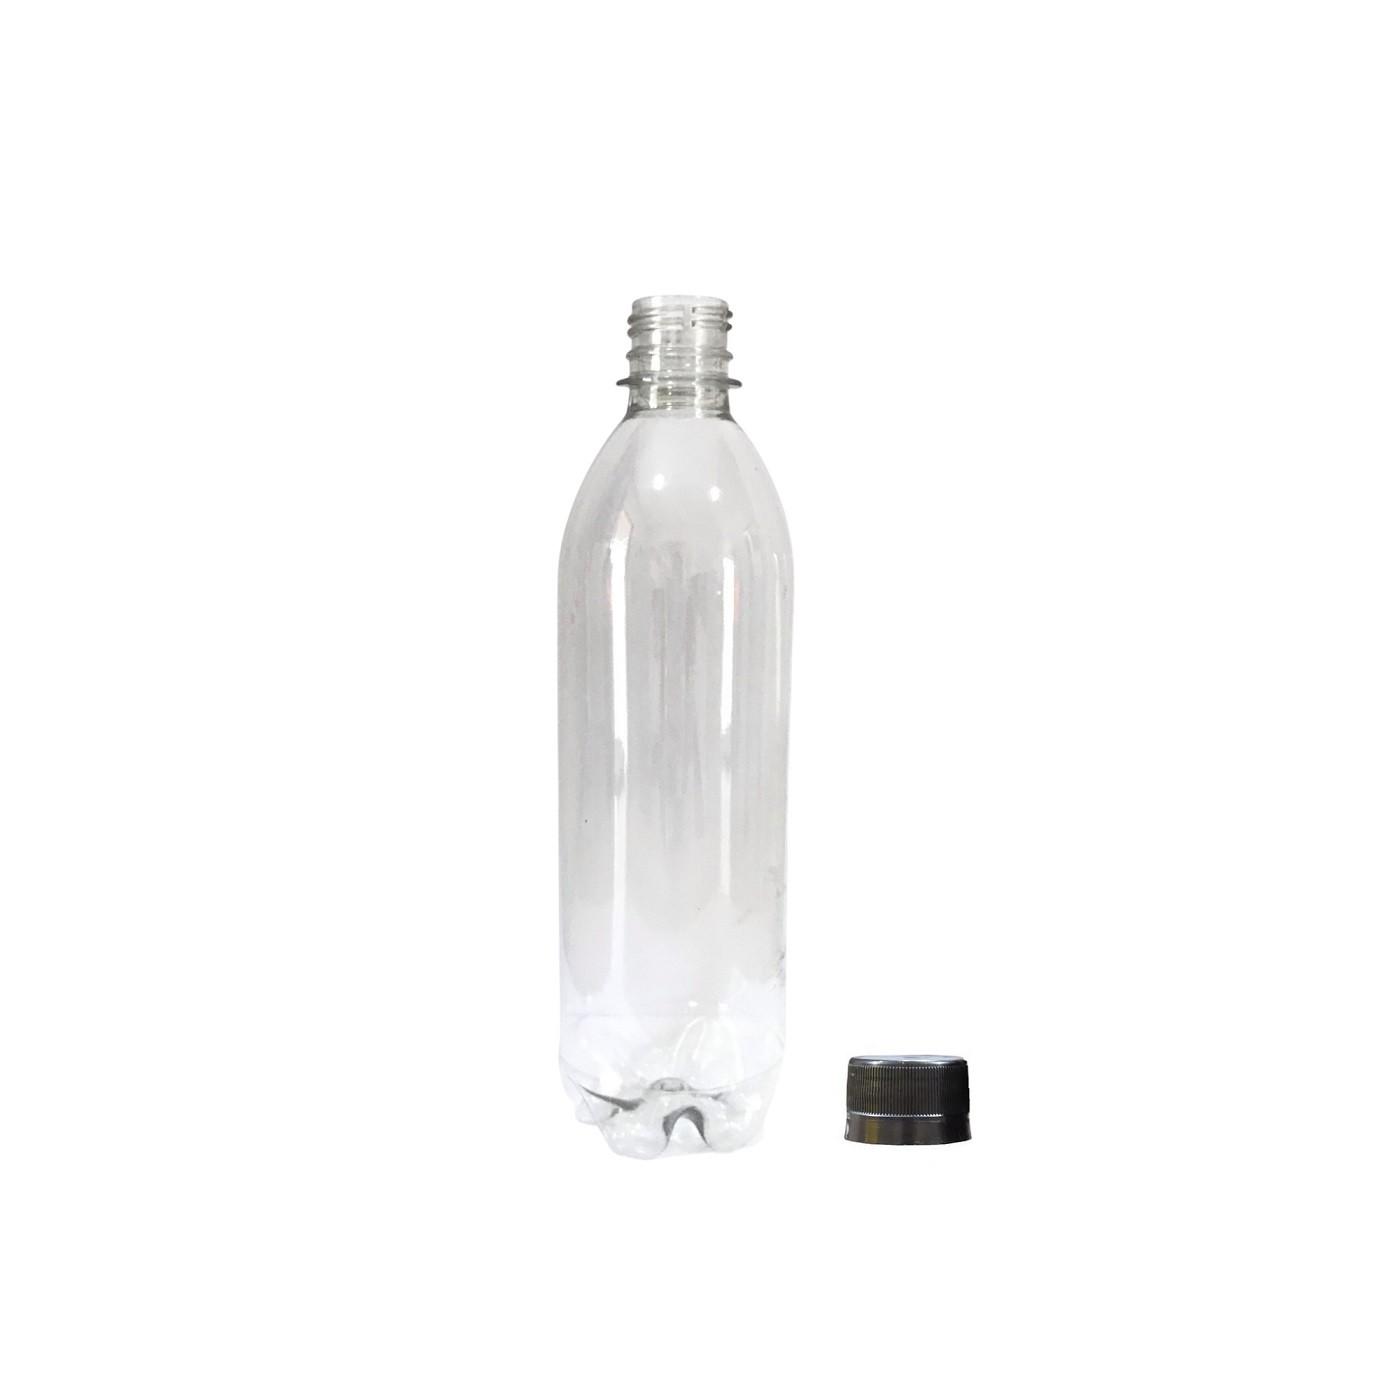 Garrafa Plástica PET Transparente 500ml (Kombucha, Sucos, Sidra)